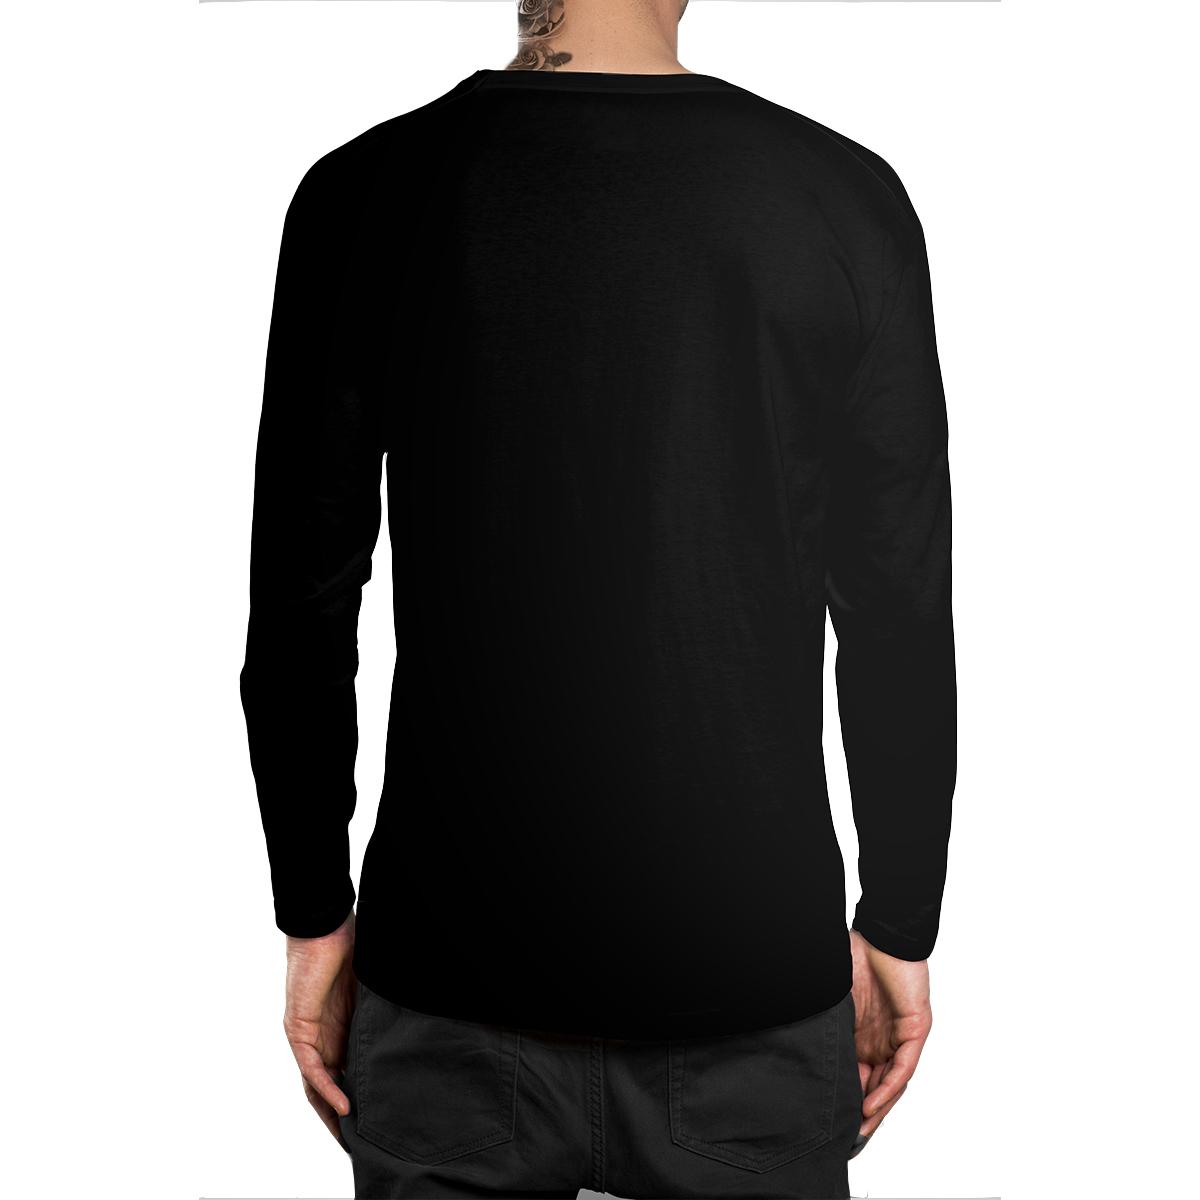 Stompy Camiseta Manga Longa Modelo 17